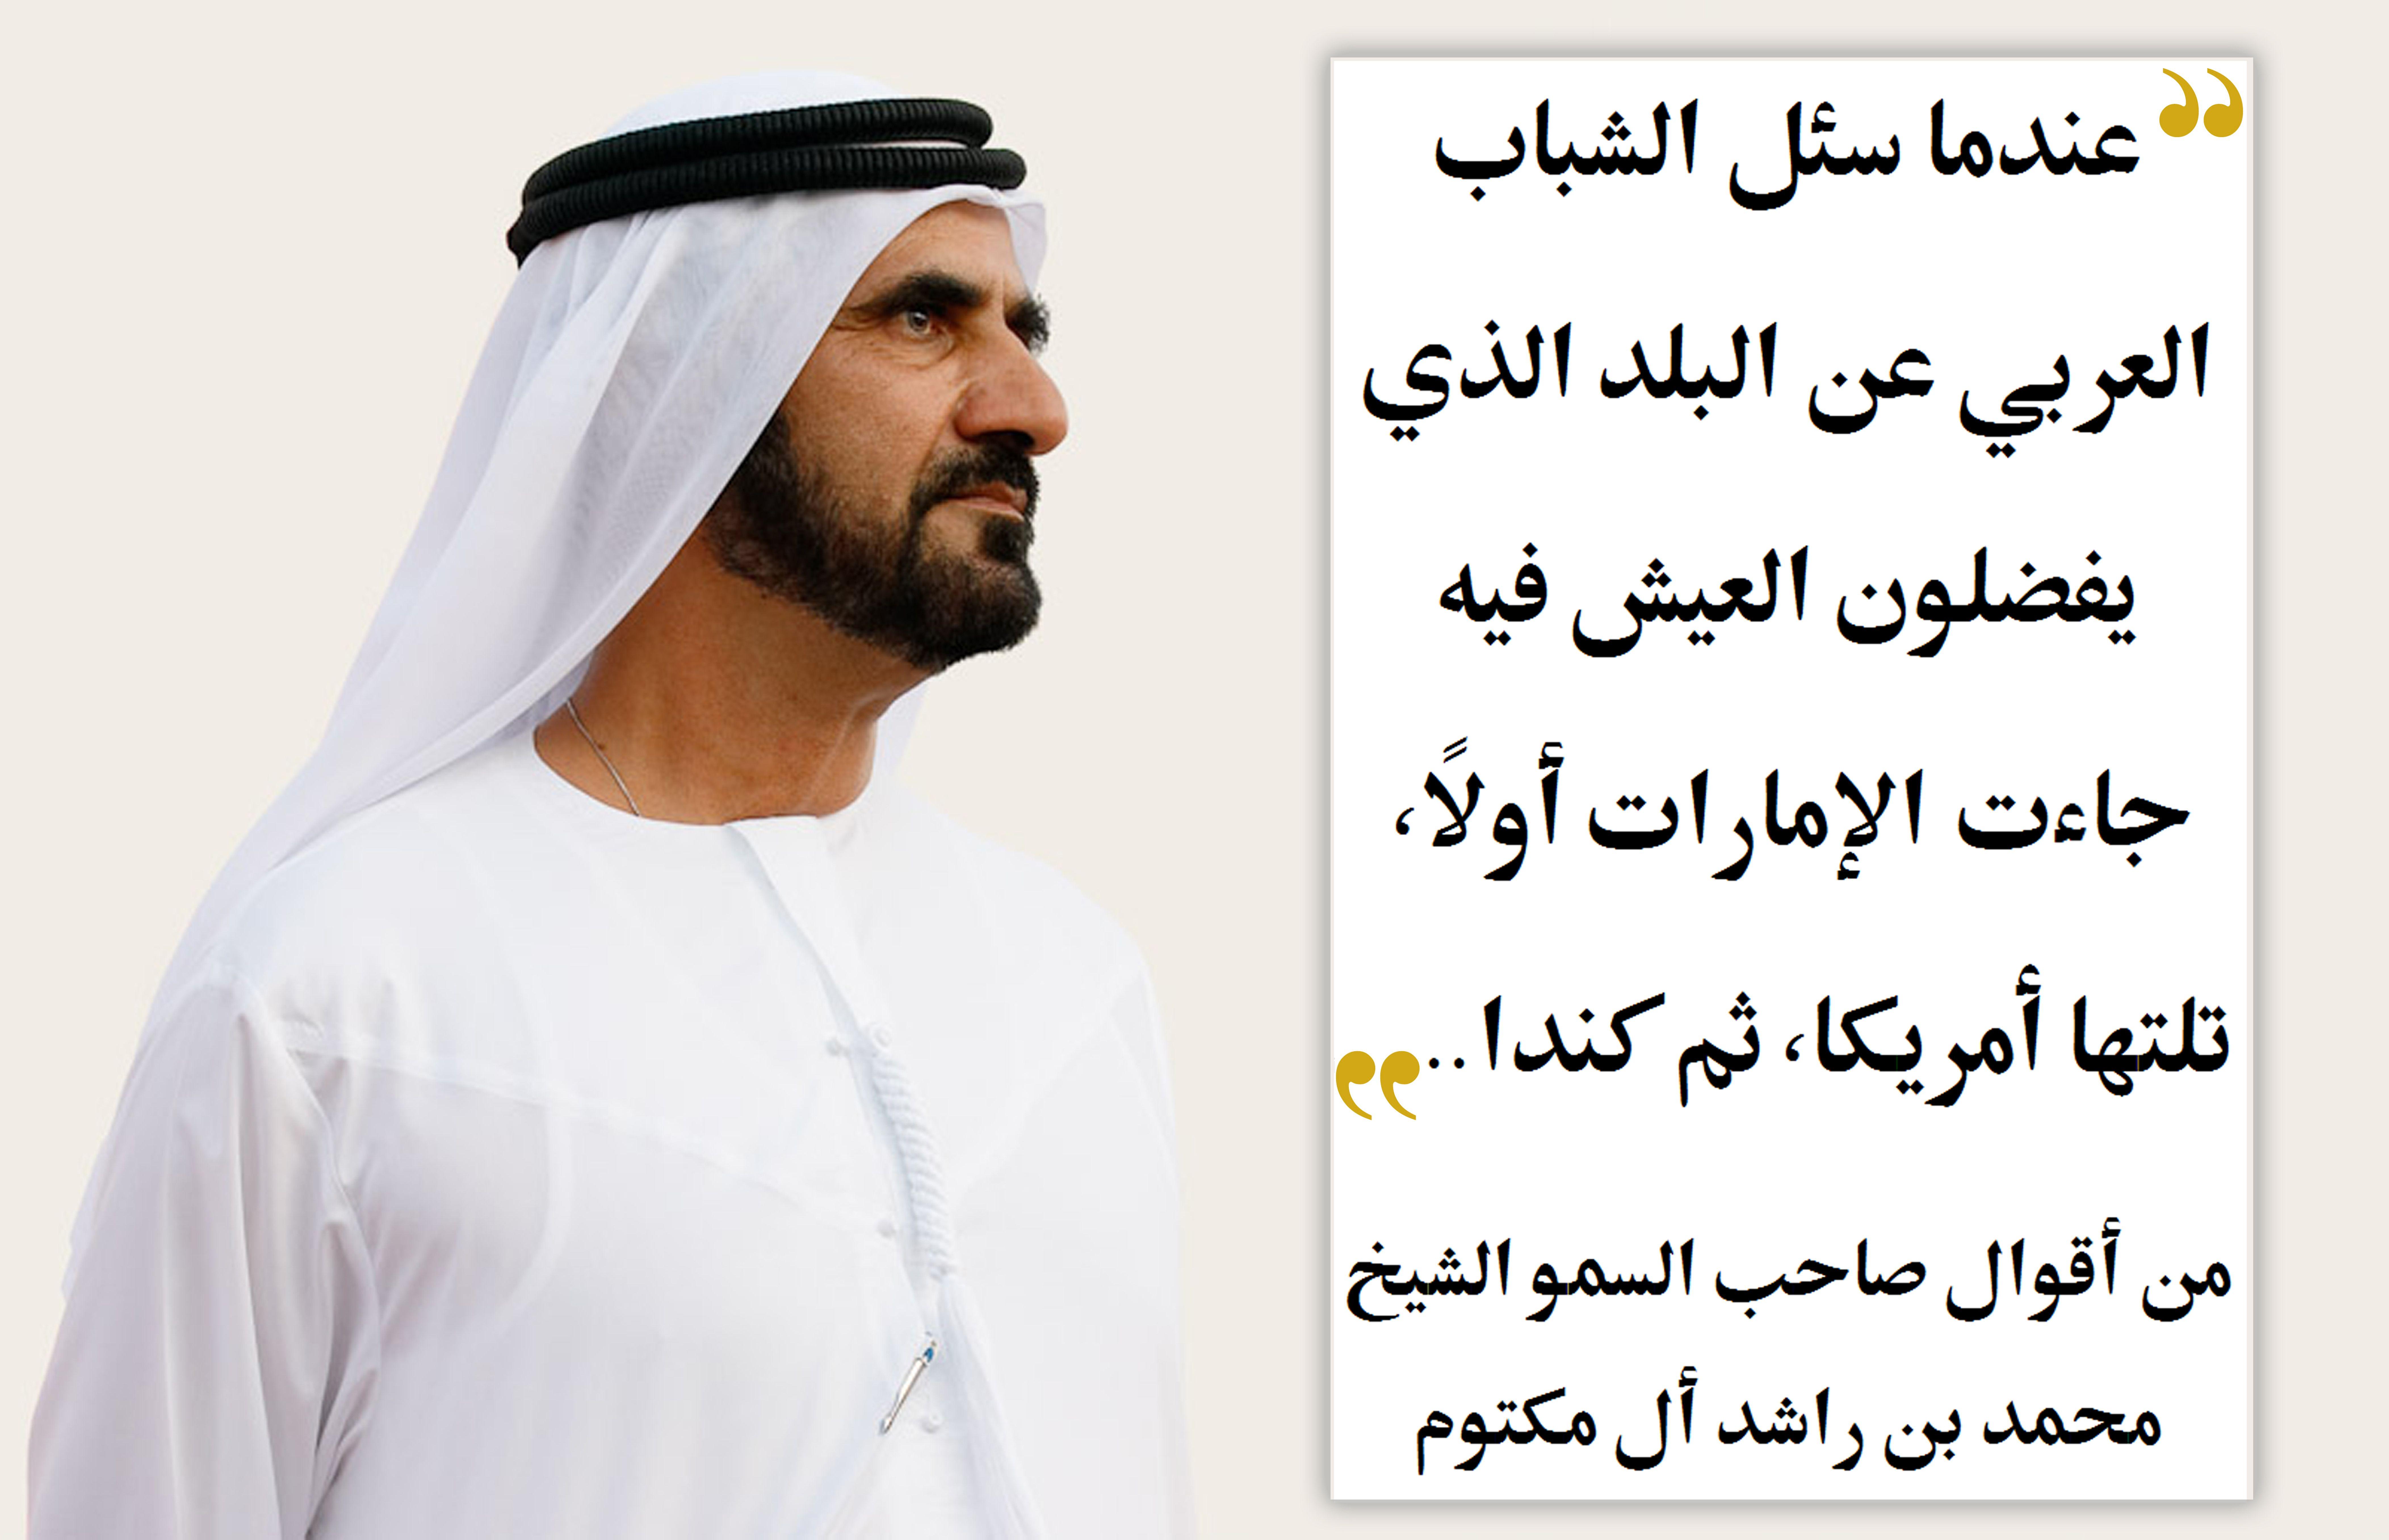 Uae Is For Everyone Sheikh Mohammed Sheikh Mohammed Uae For Everyone